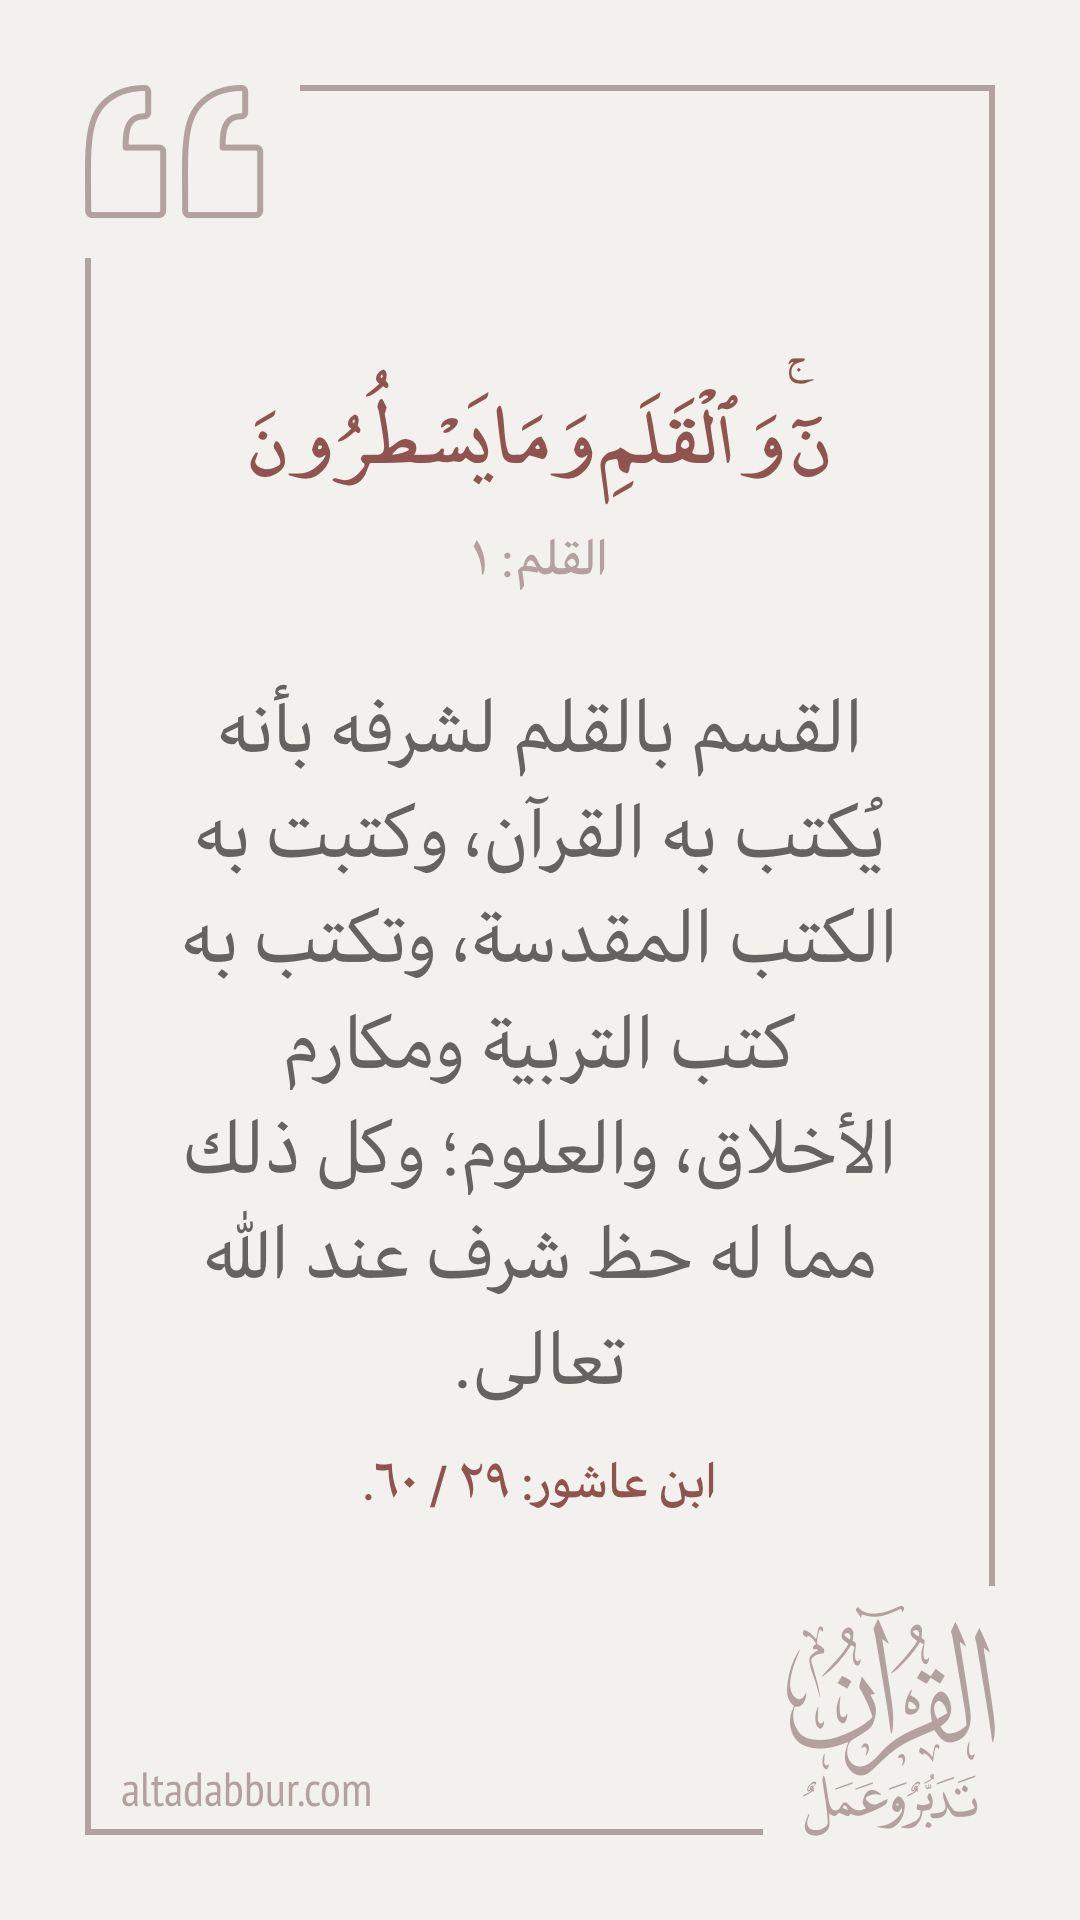 Pin By On قرآن تفسير وتدب ر In 2020 Quran Quotes Islamic Quotes Quran Tafseer